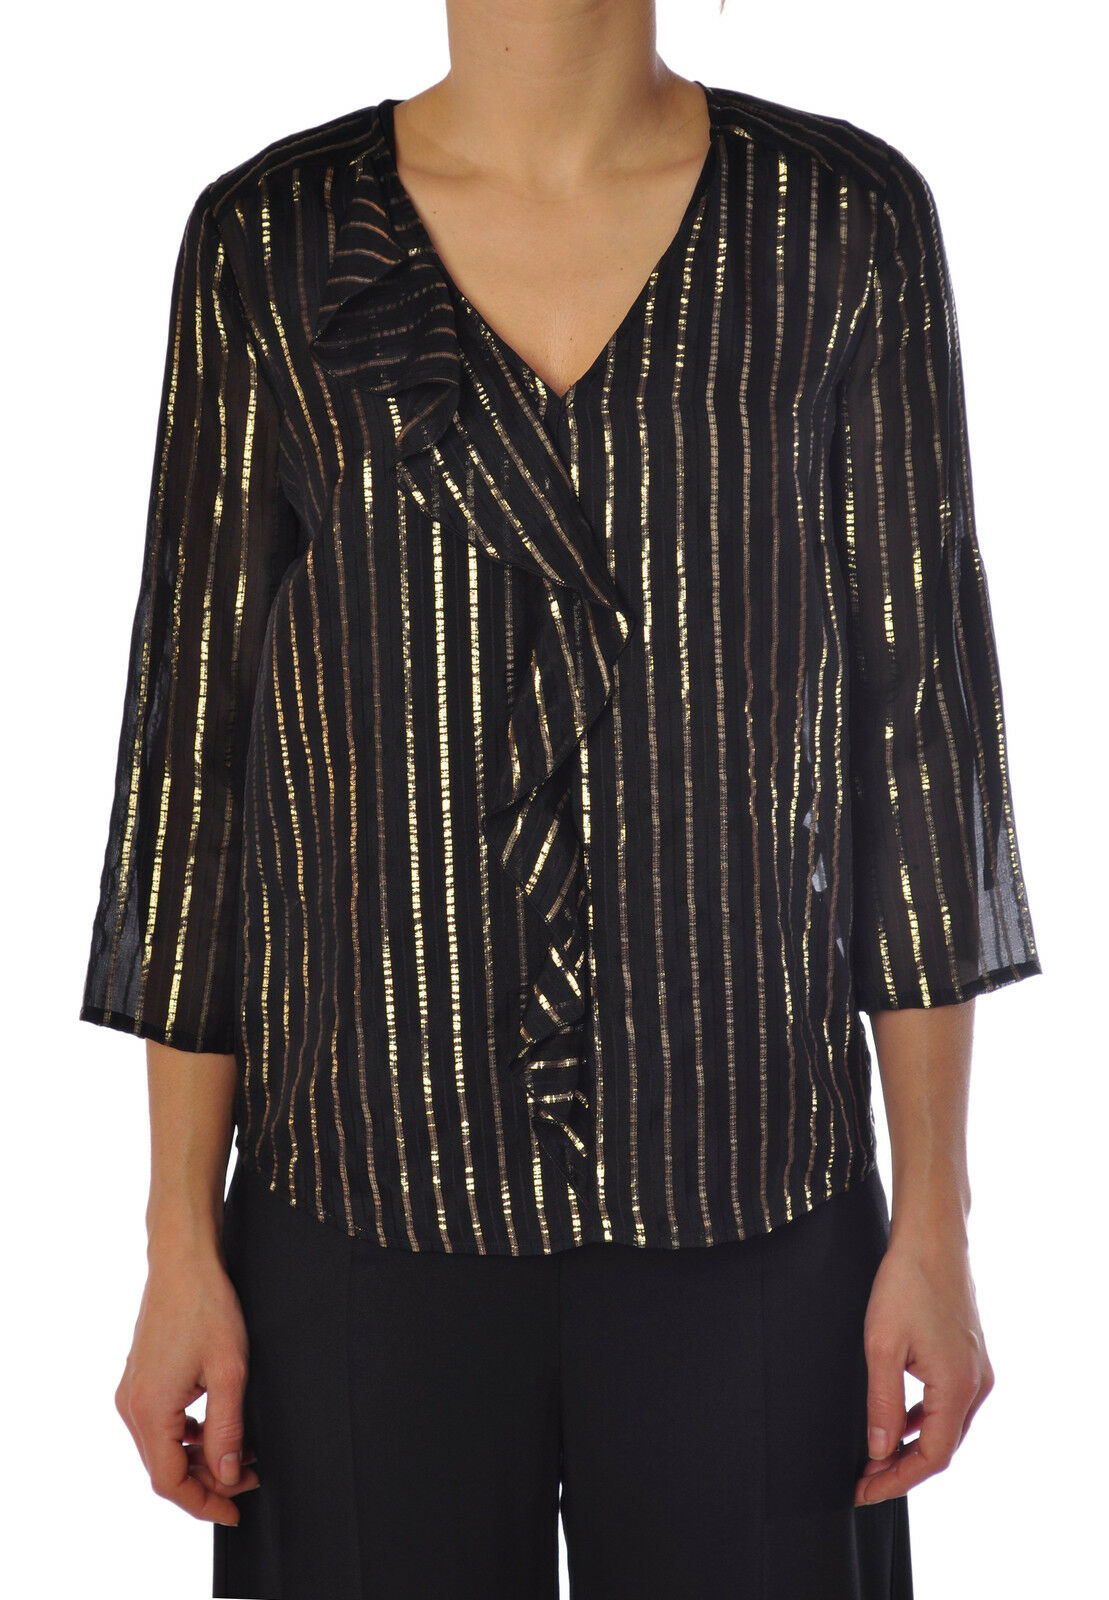 Patrizia Pepe  -  Shirt - Female - 46 - schwarz - 1343603B164040